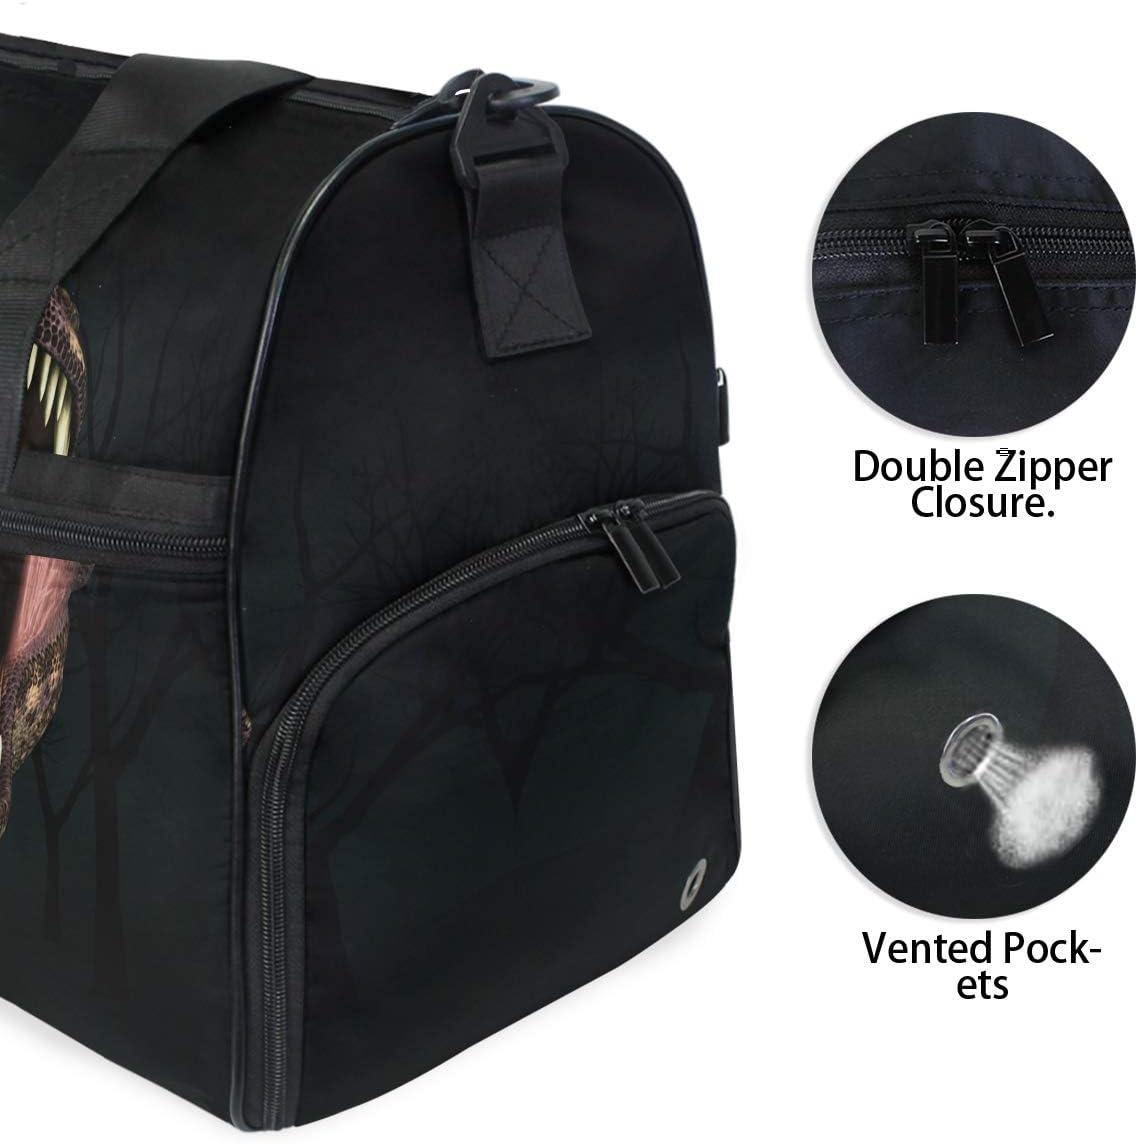 ALAZA Tyrannosaurus Rex Sports Gym Duffel Bag Travel Luggage Handbag Shoulder Bag with Shoes Compartment for Men Women